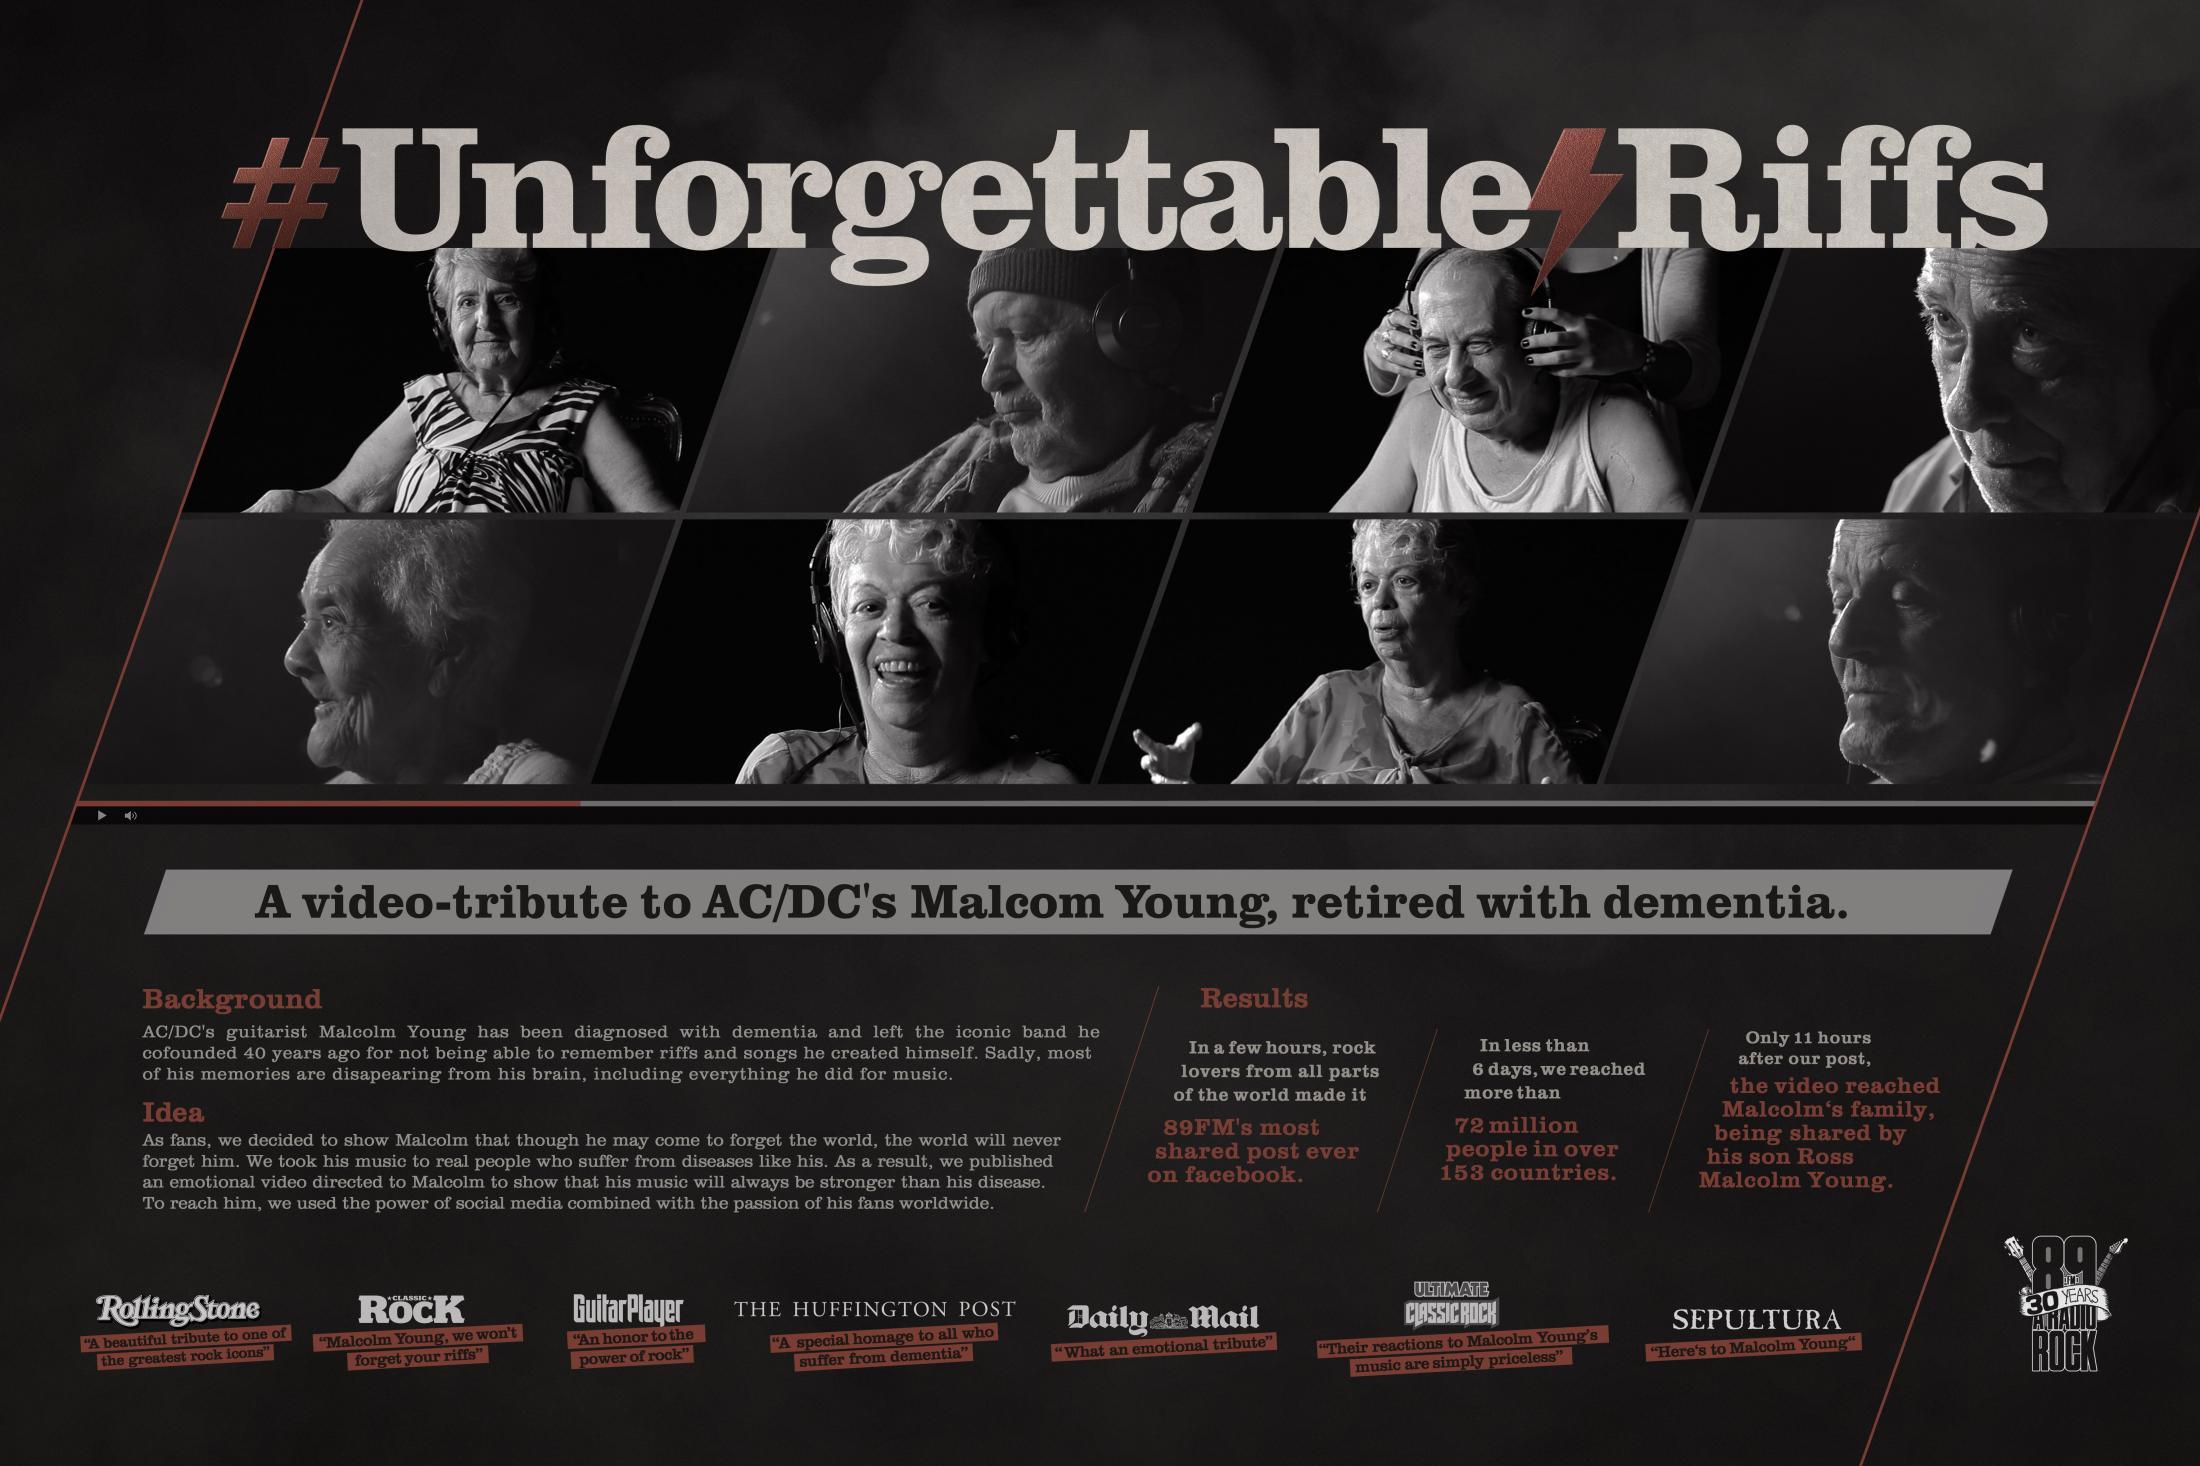 Thumbnail for #UnforgettableRiffs